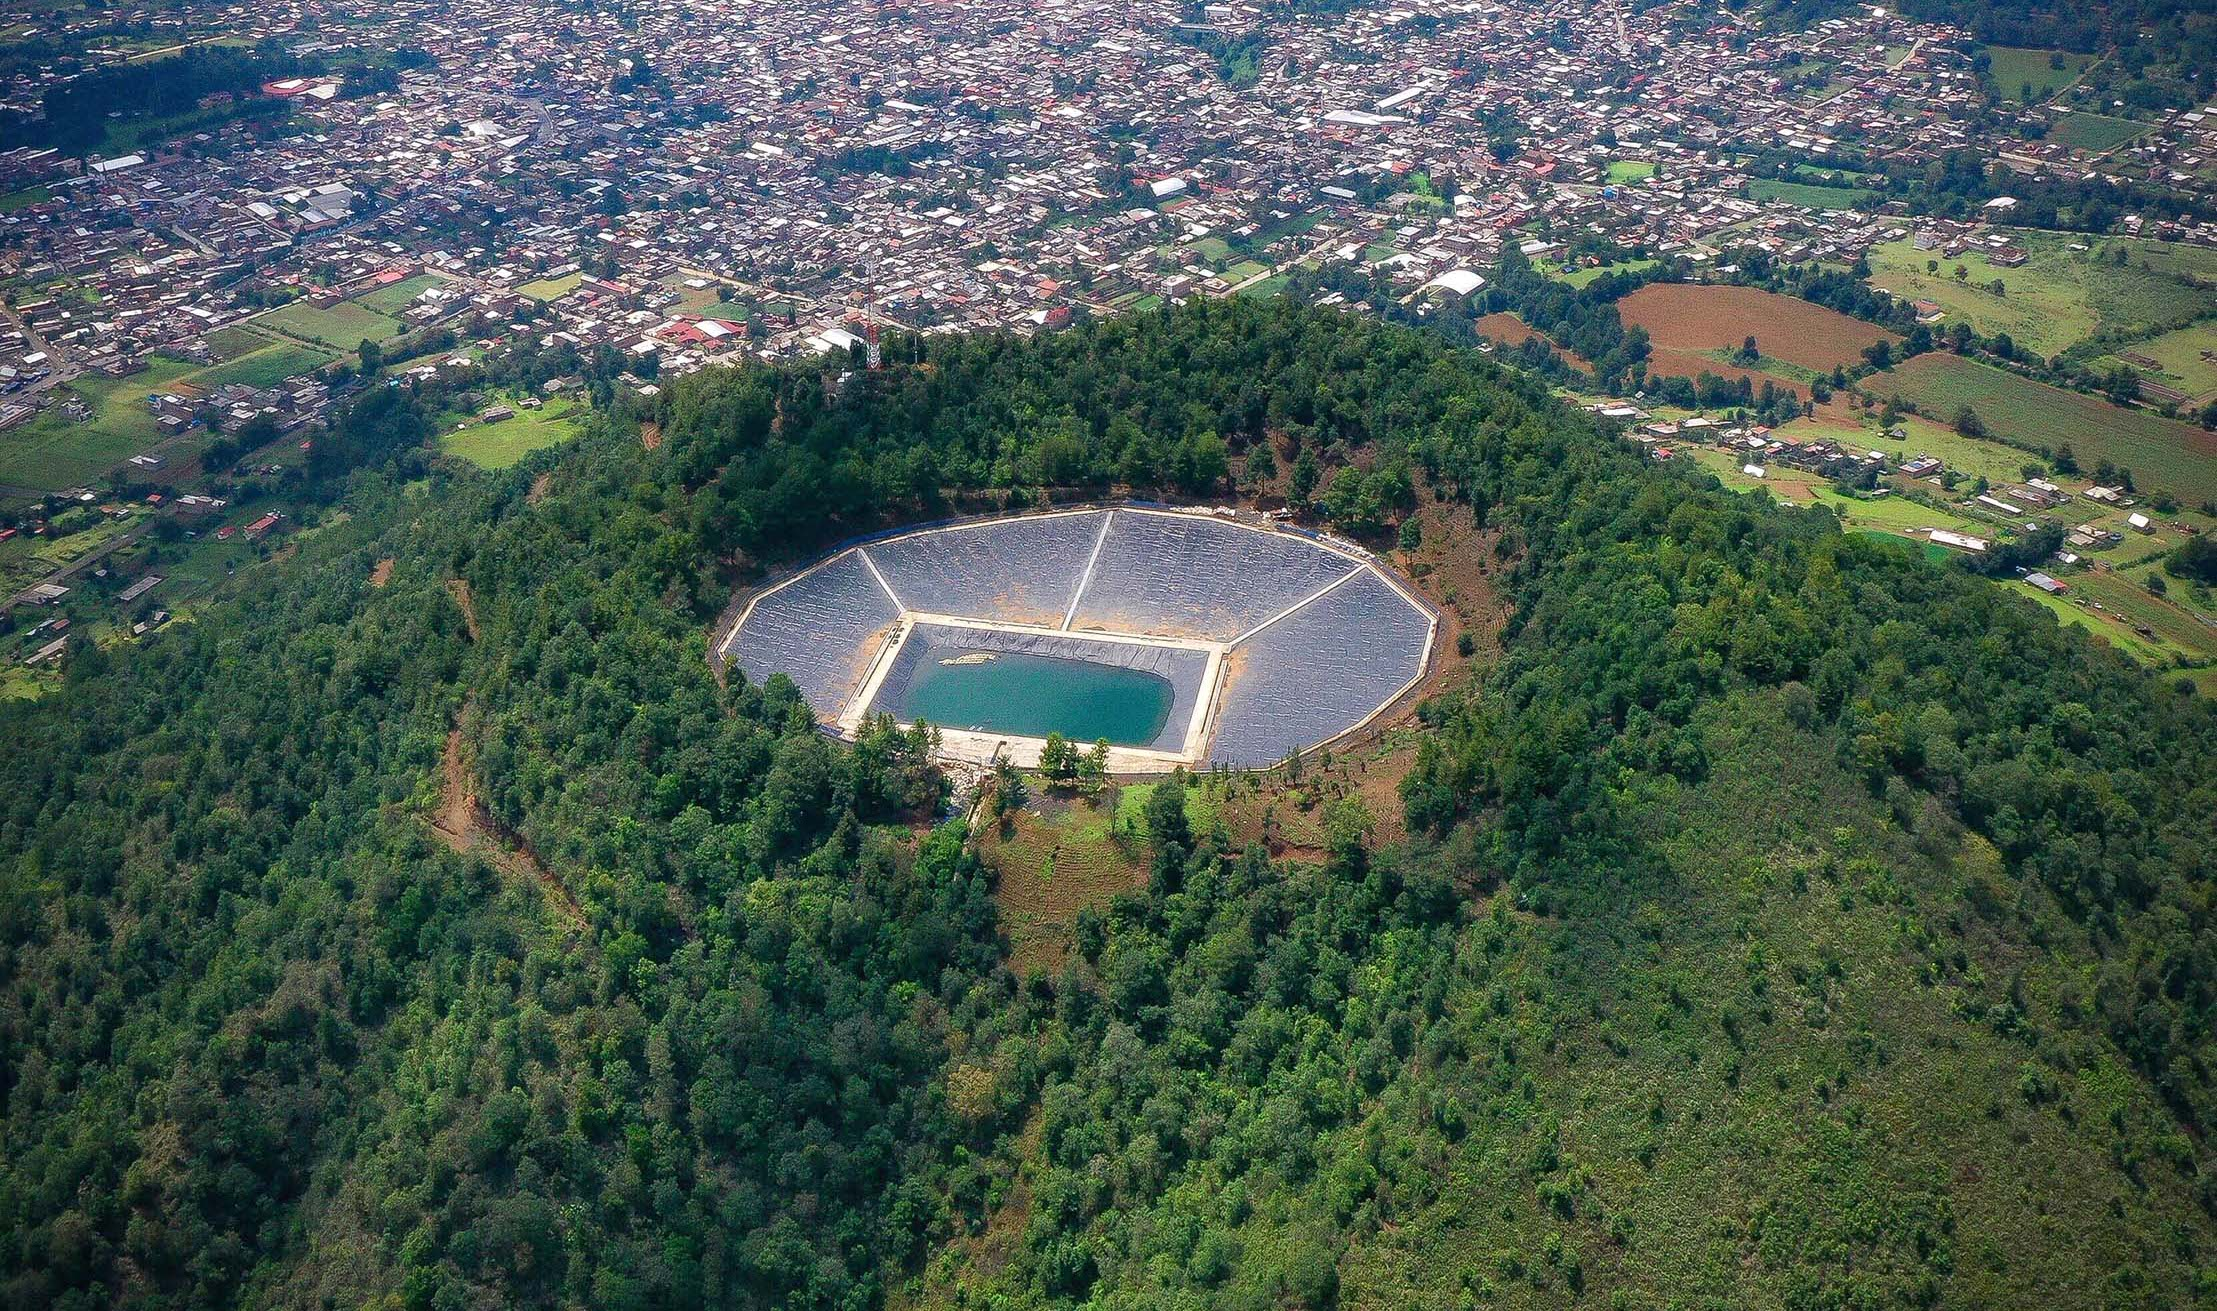 Mich: El captador de agua de lluvia más grande de Latinoamérica está en Cherán (México Desconocido)